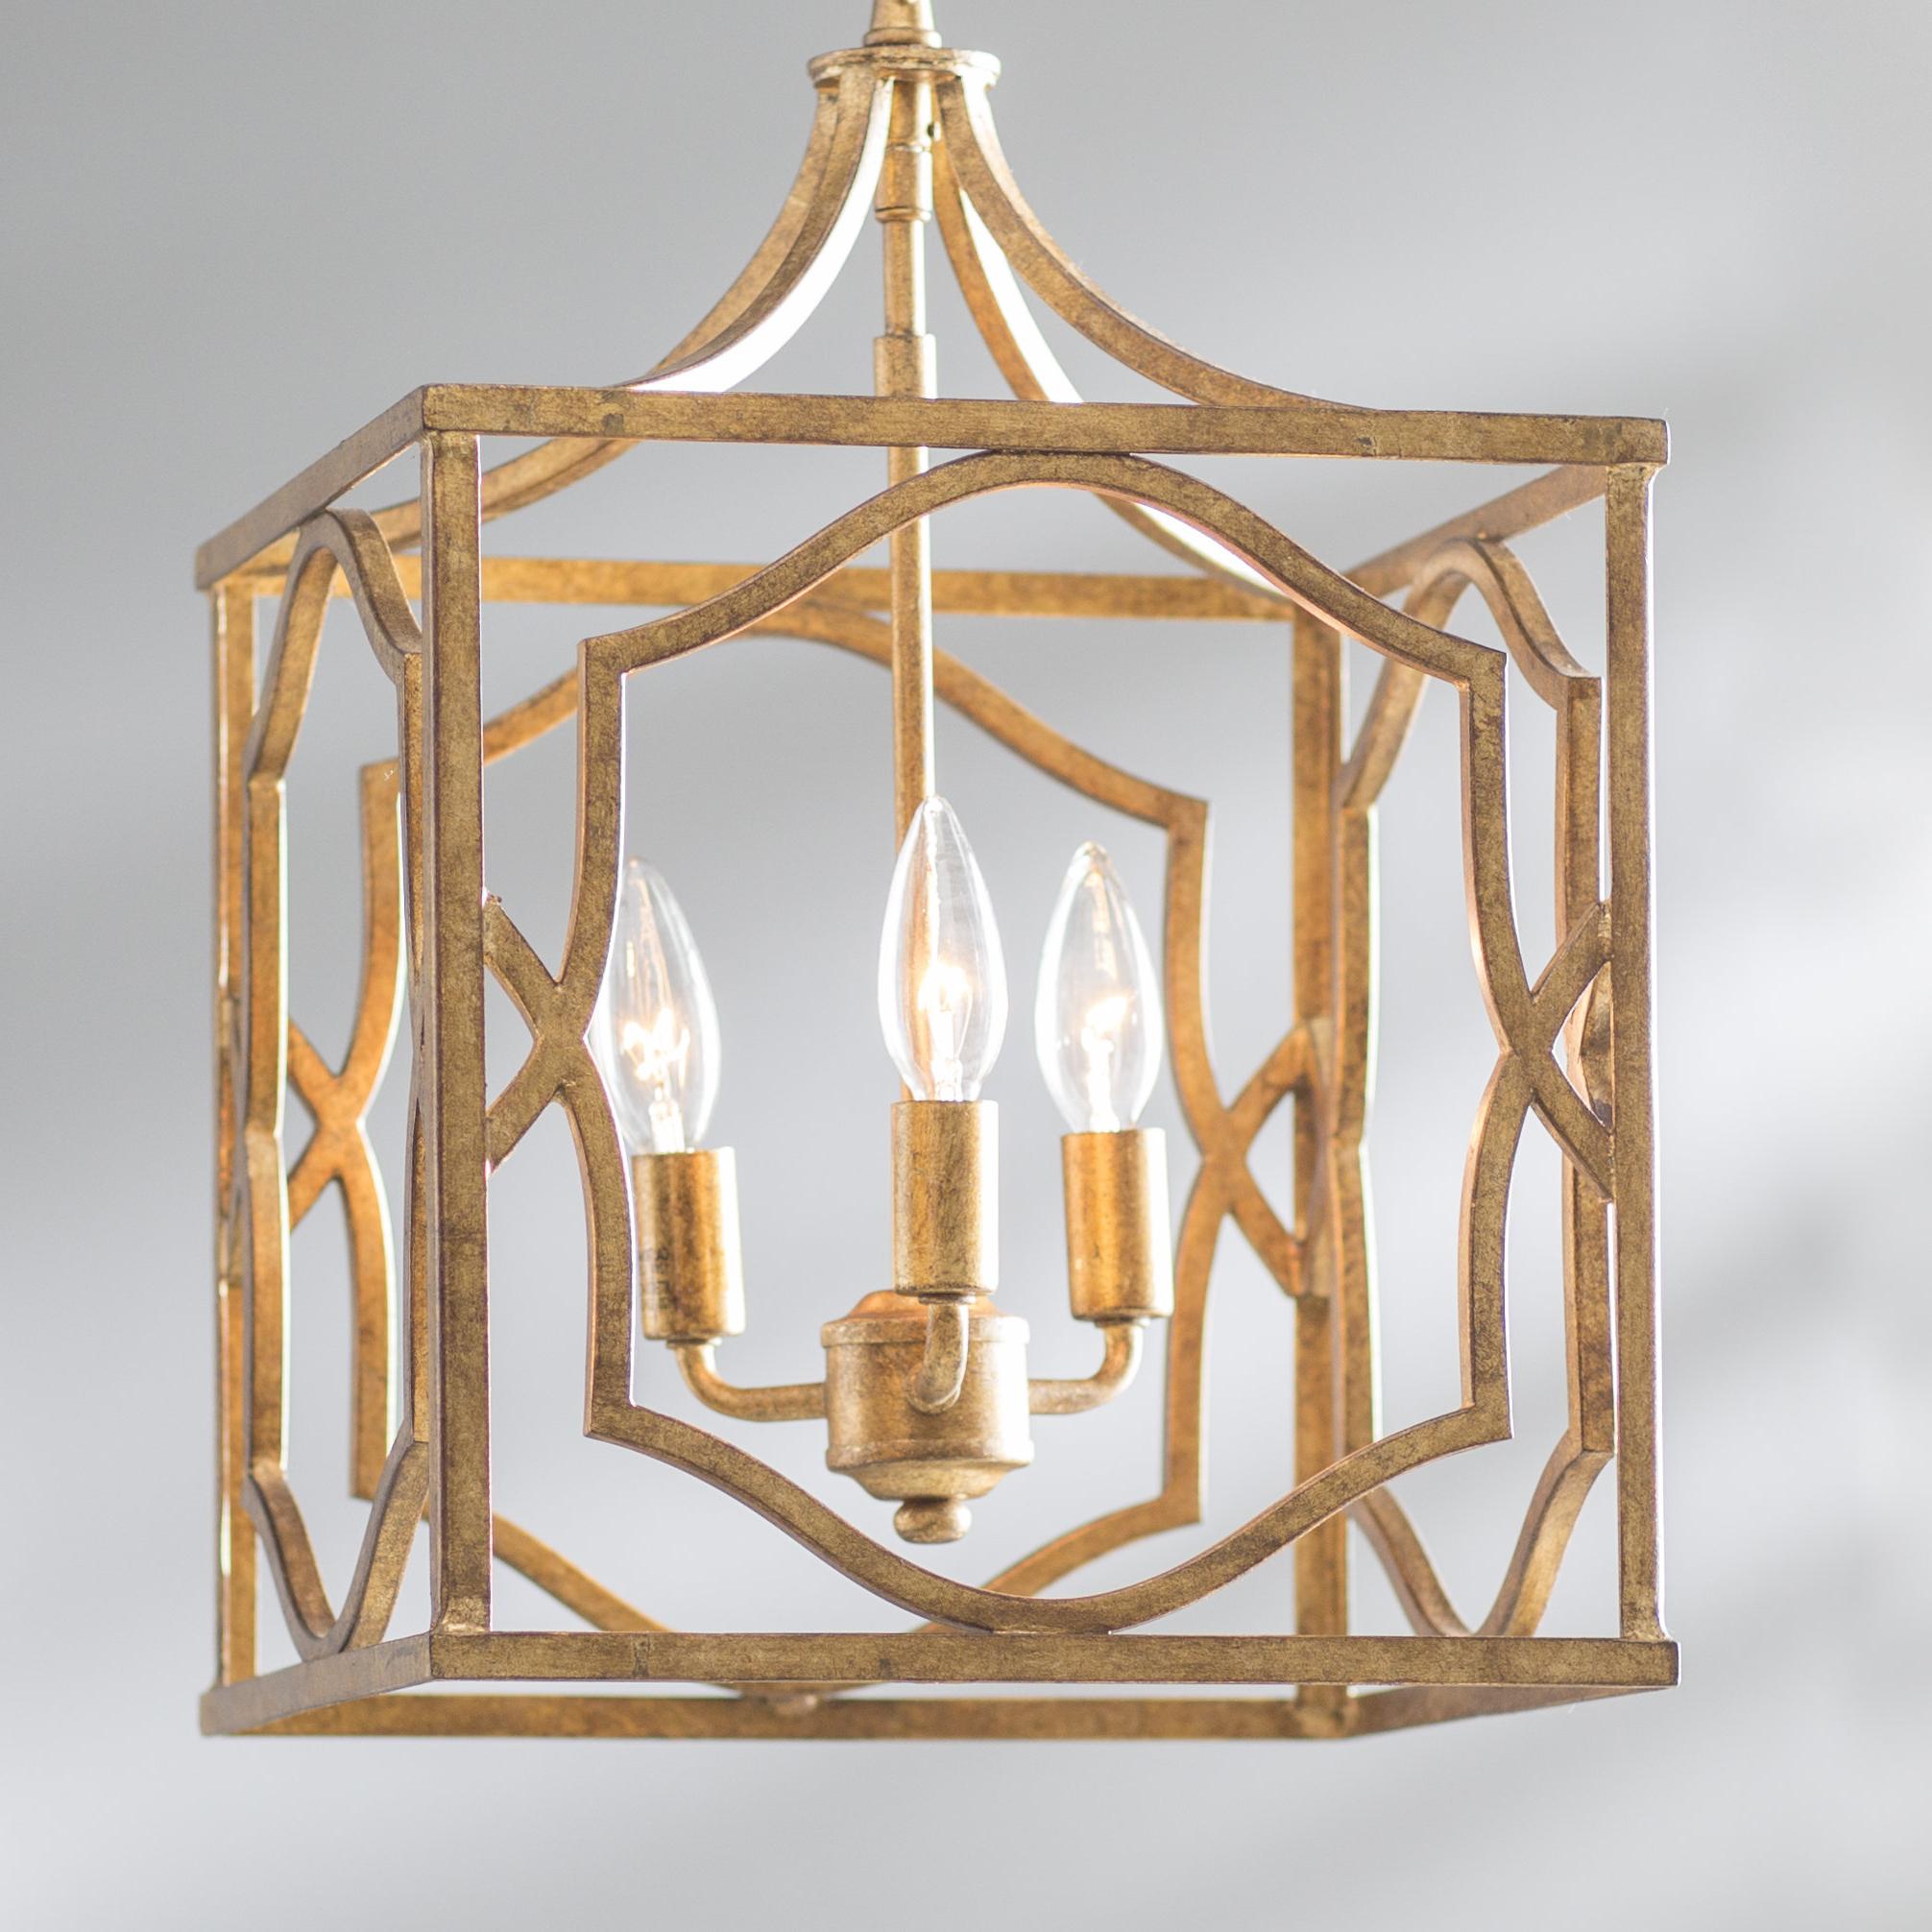 Willa Arlo Interiors Destrey 3 Light Lantern Pendant Throughout Favorite Destrey 3 Light Lantern Square/rectangle Pendants (Gallery 16 of 20)